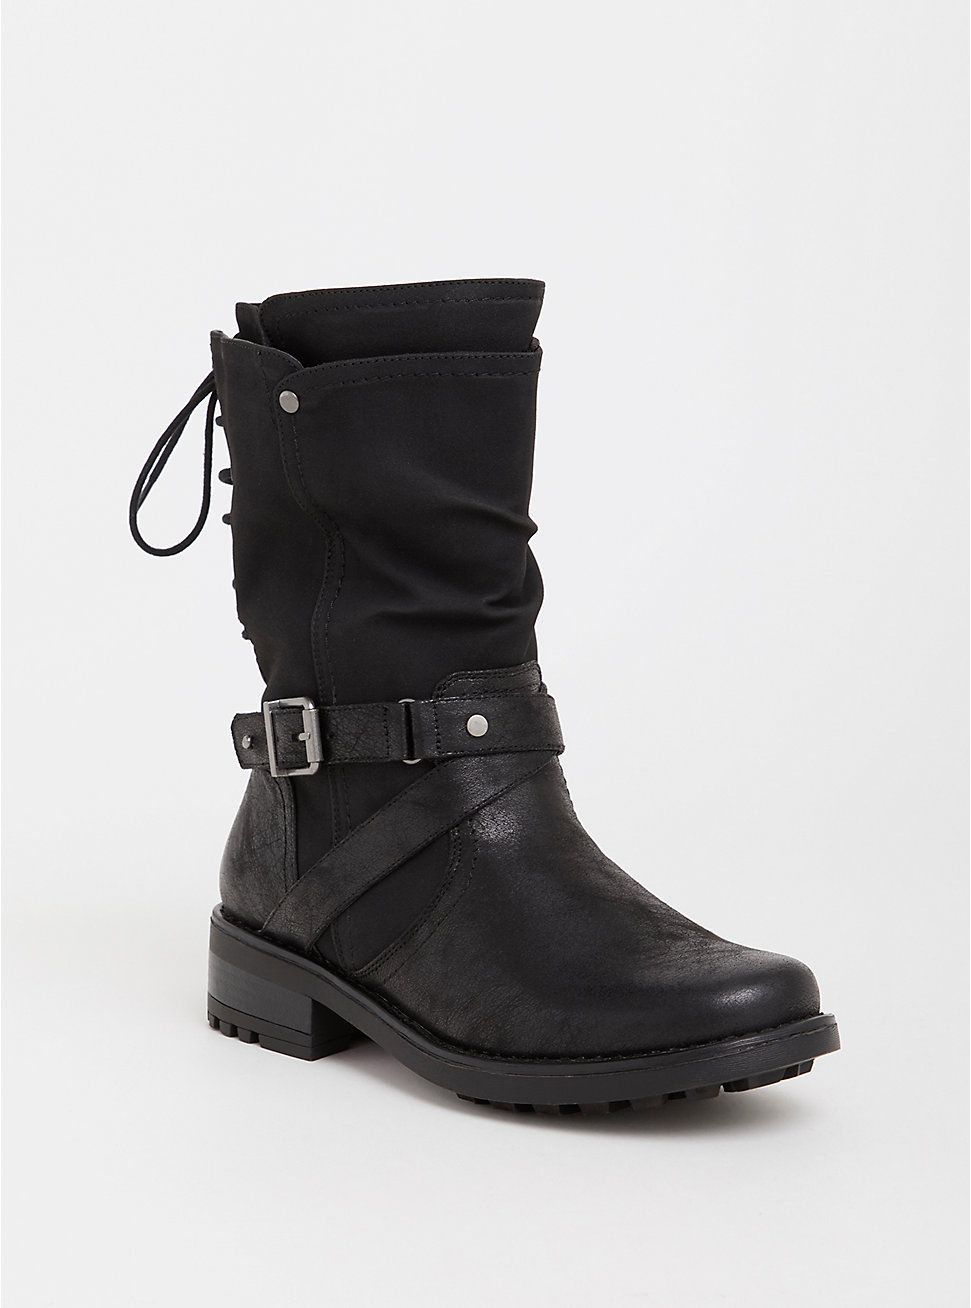 2957a1b5433 Black Faux Leather Moto Boot (Wide Width) | Kenzie | Moto boots ...